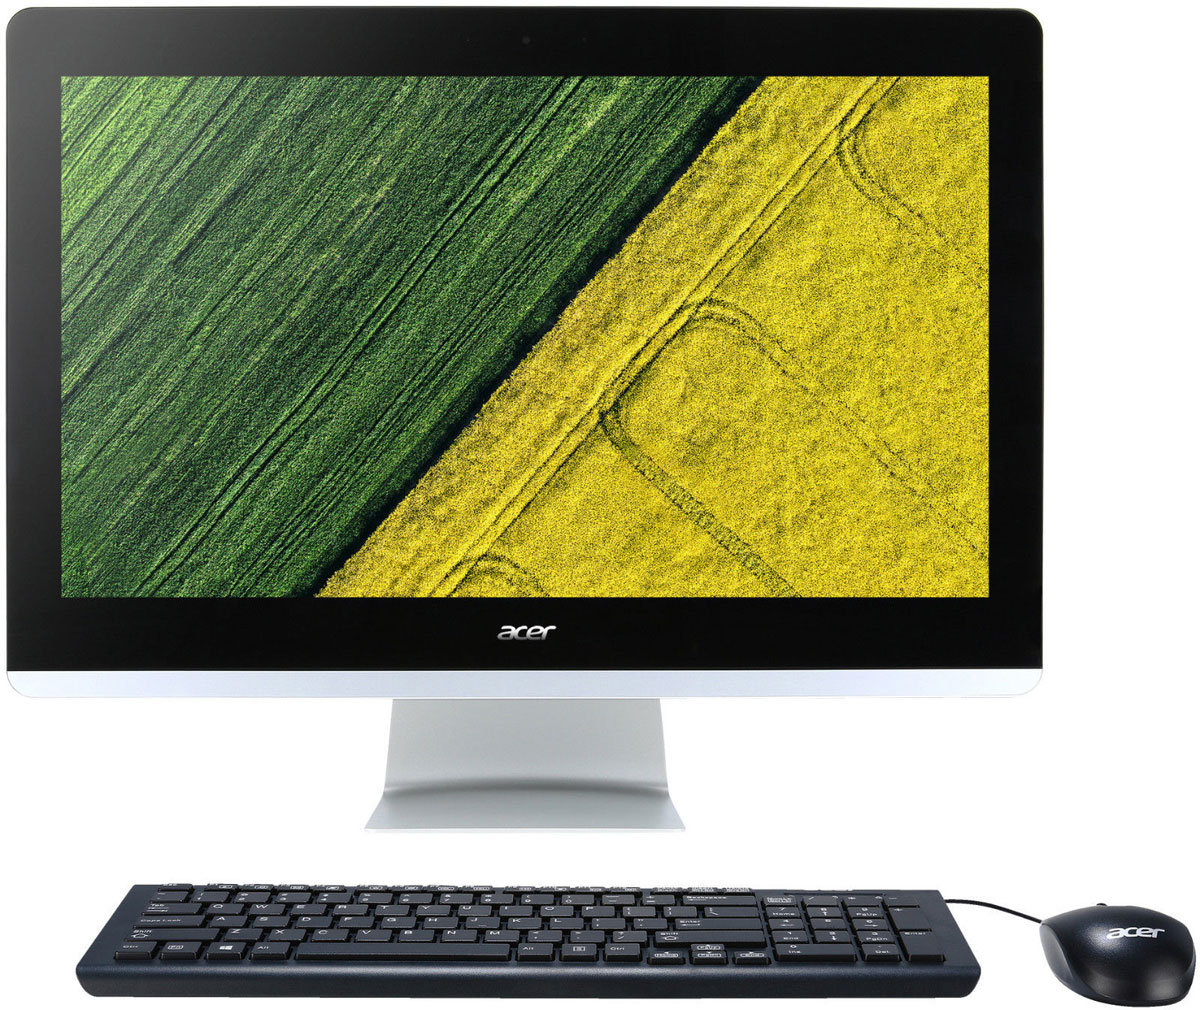 Zakazat.ru Acer Aspire Z22-780, Black моноблок (DQ.B82ER.002)